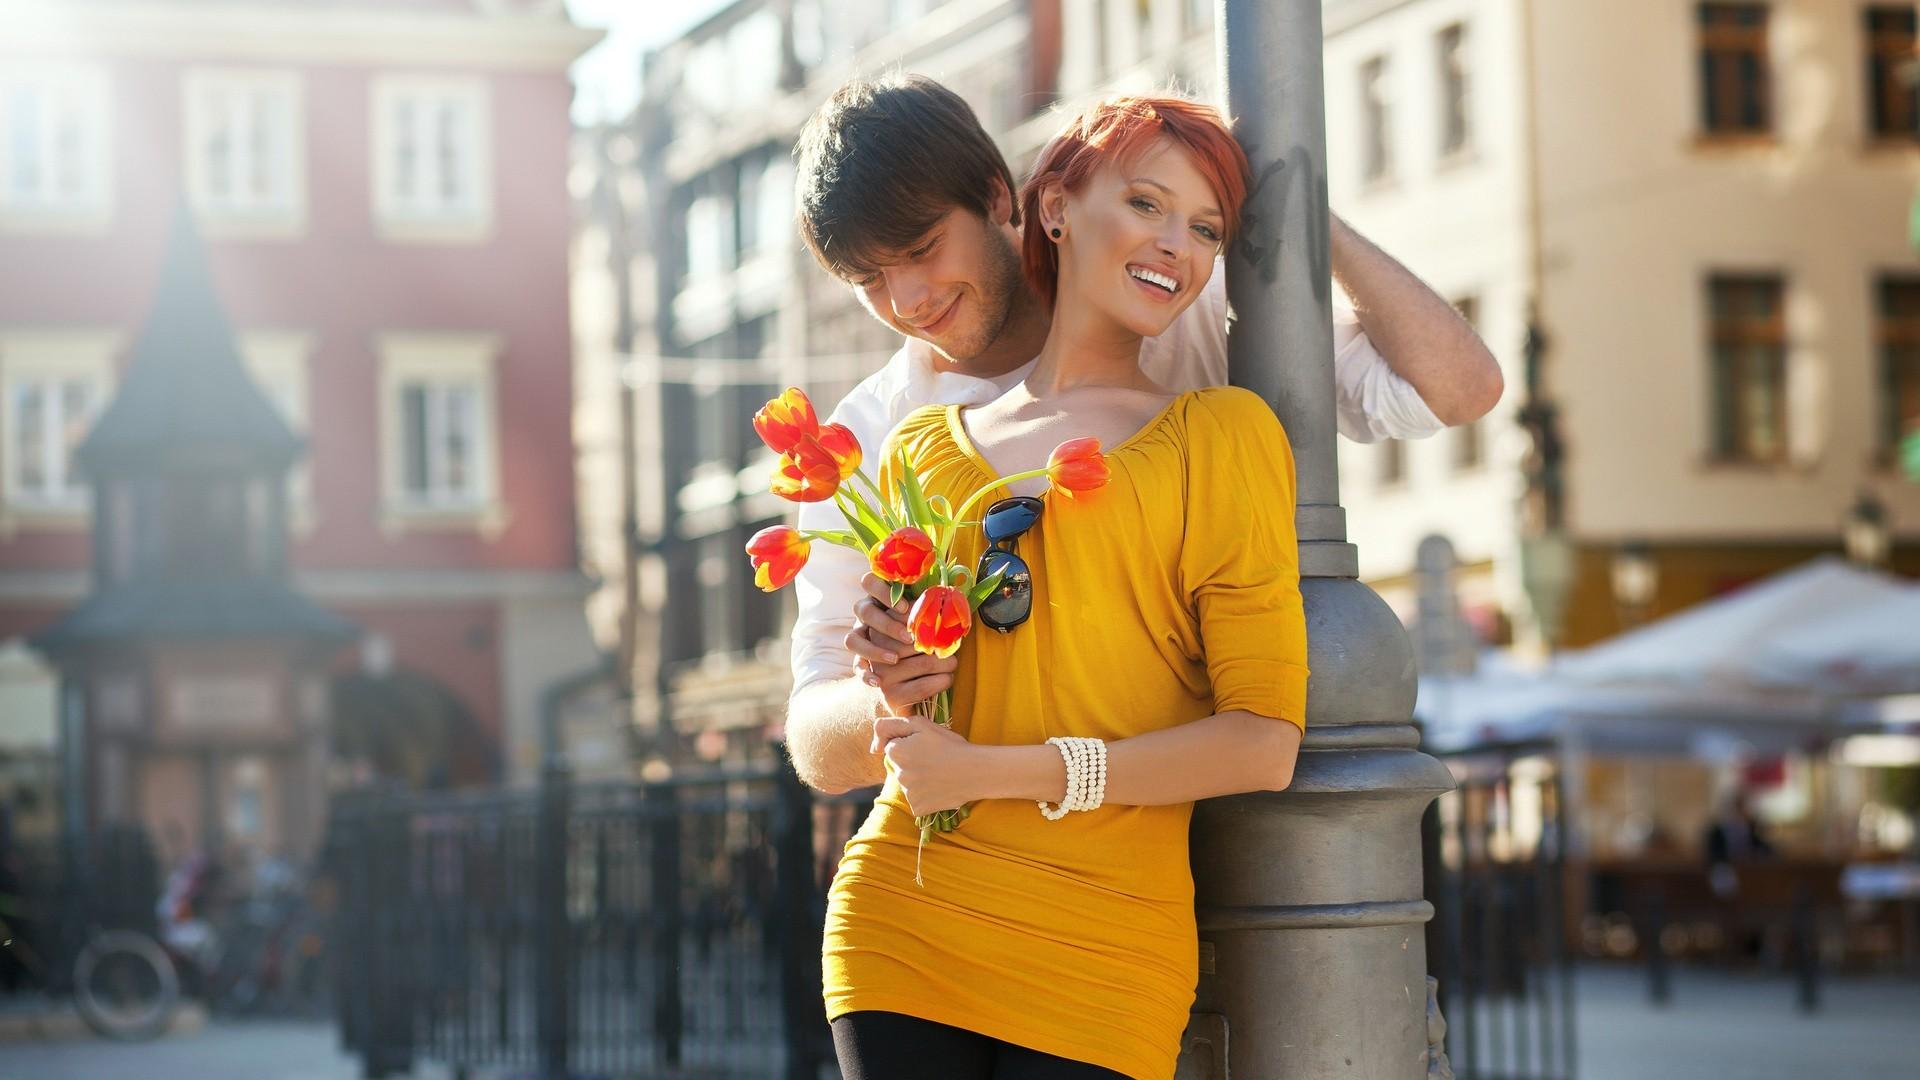 Фото: Парень дарит девушке тюльпаны